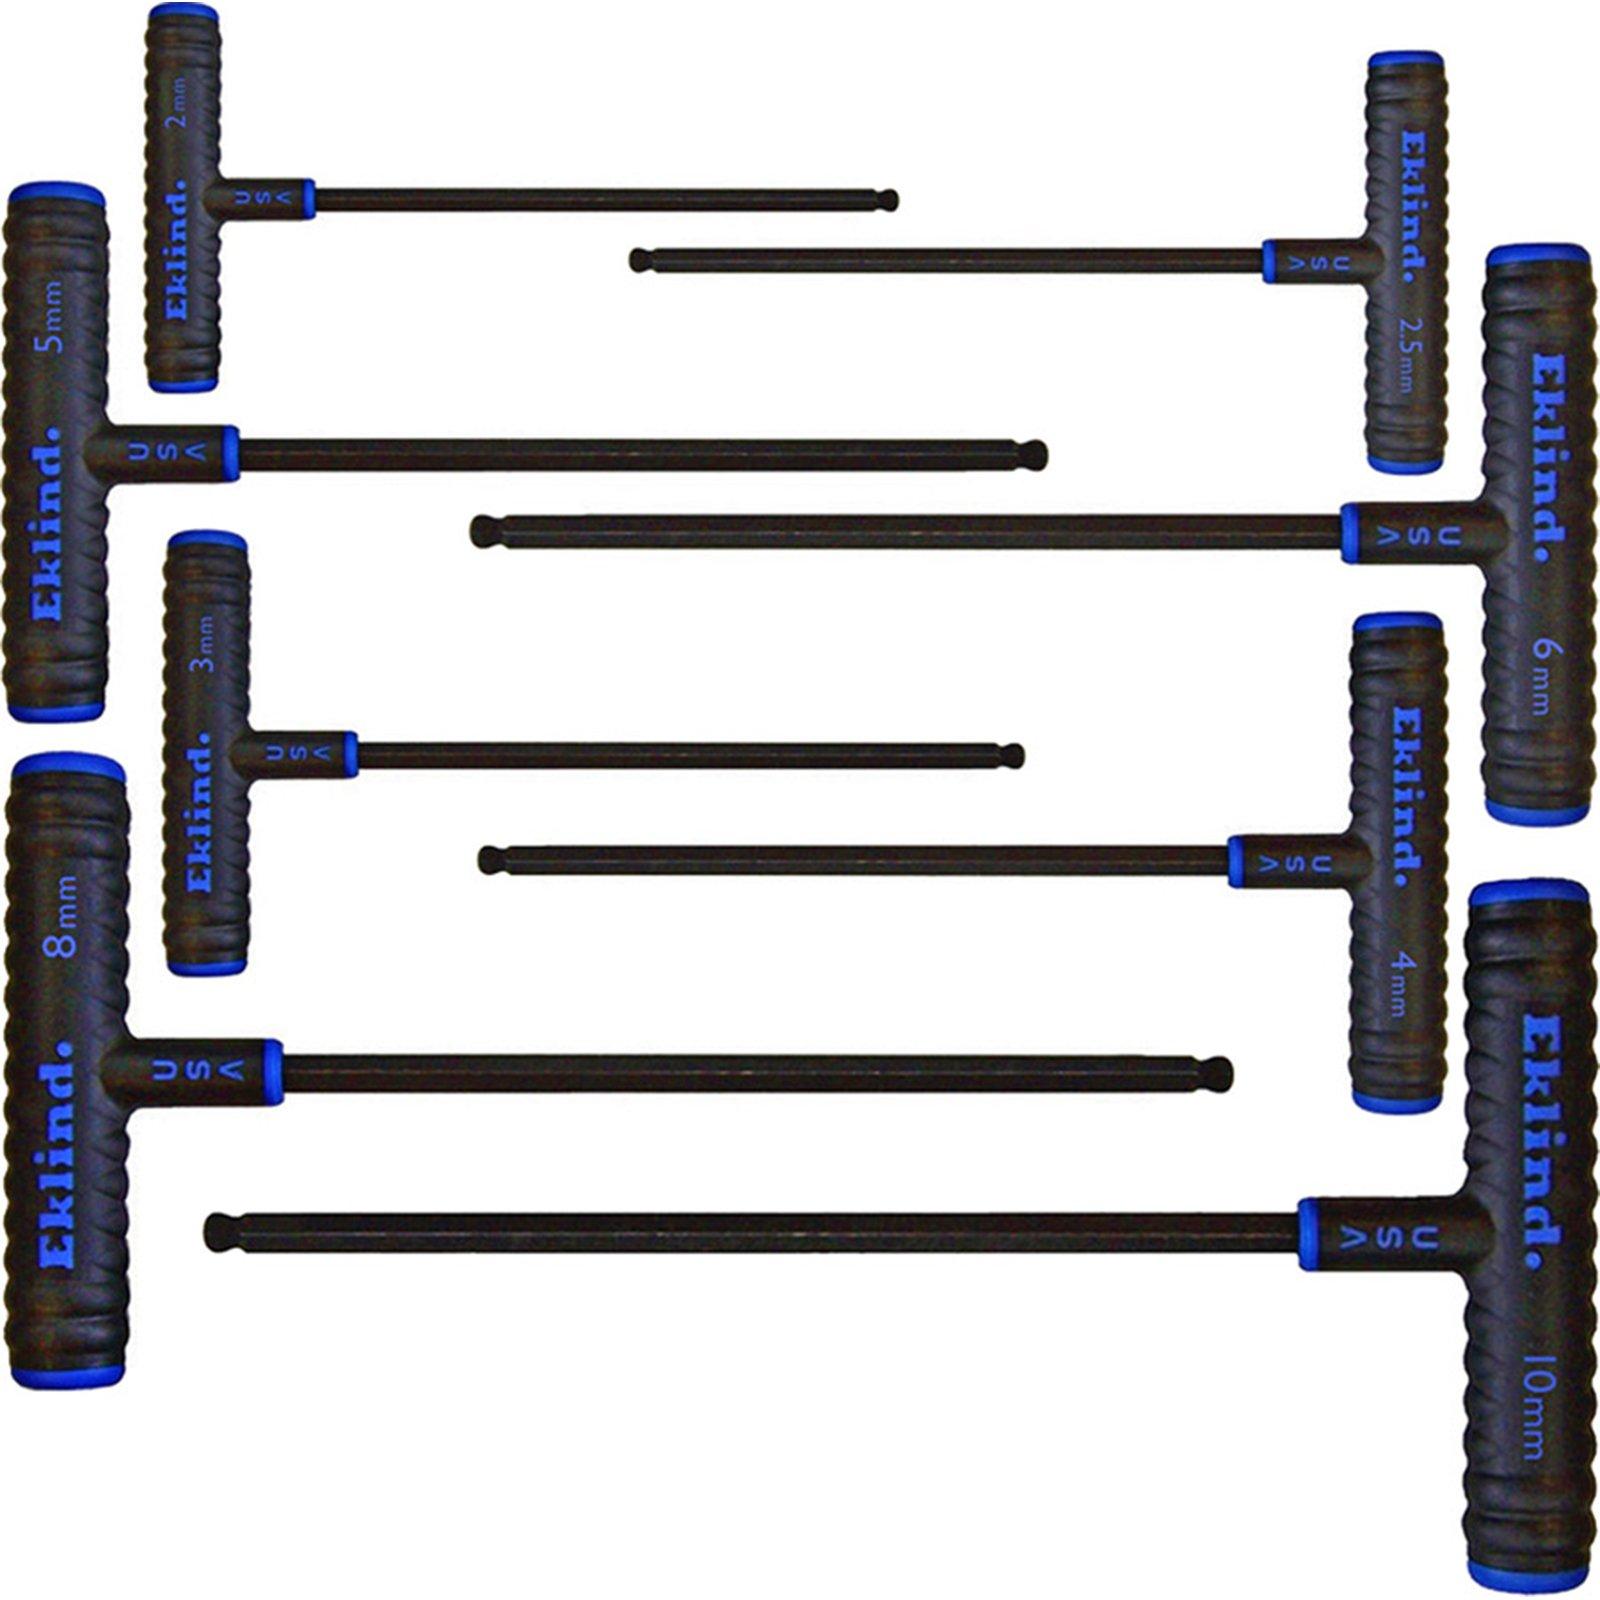 EKLIND 64808 Power-T Handle Ball-Hex Key allen wrench - 8pc set Metric MM sizes 2-10 (9In shaft) by Eklind Tool